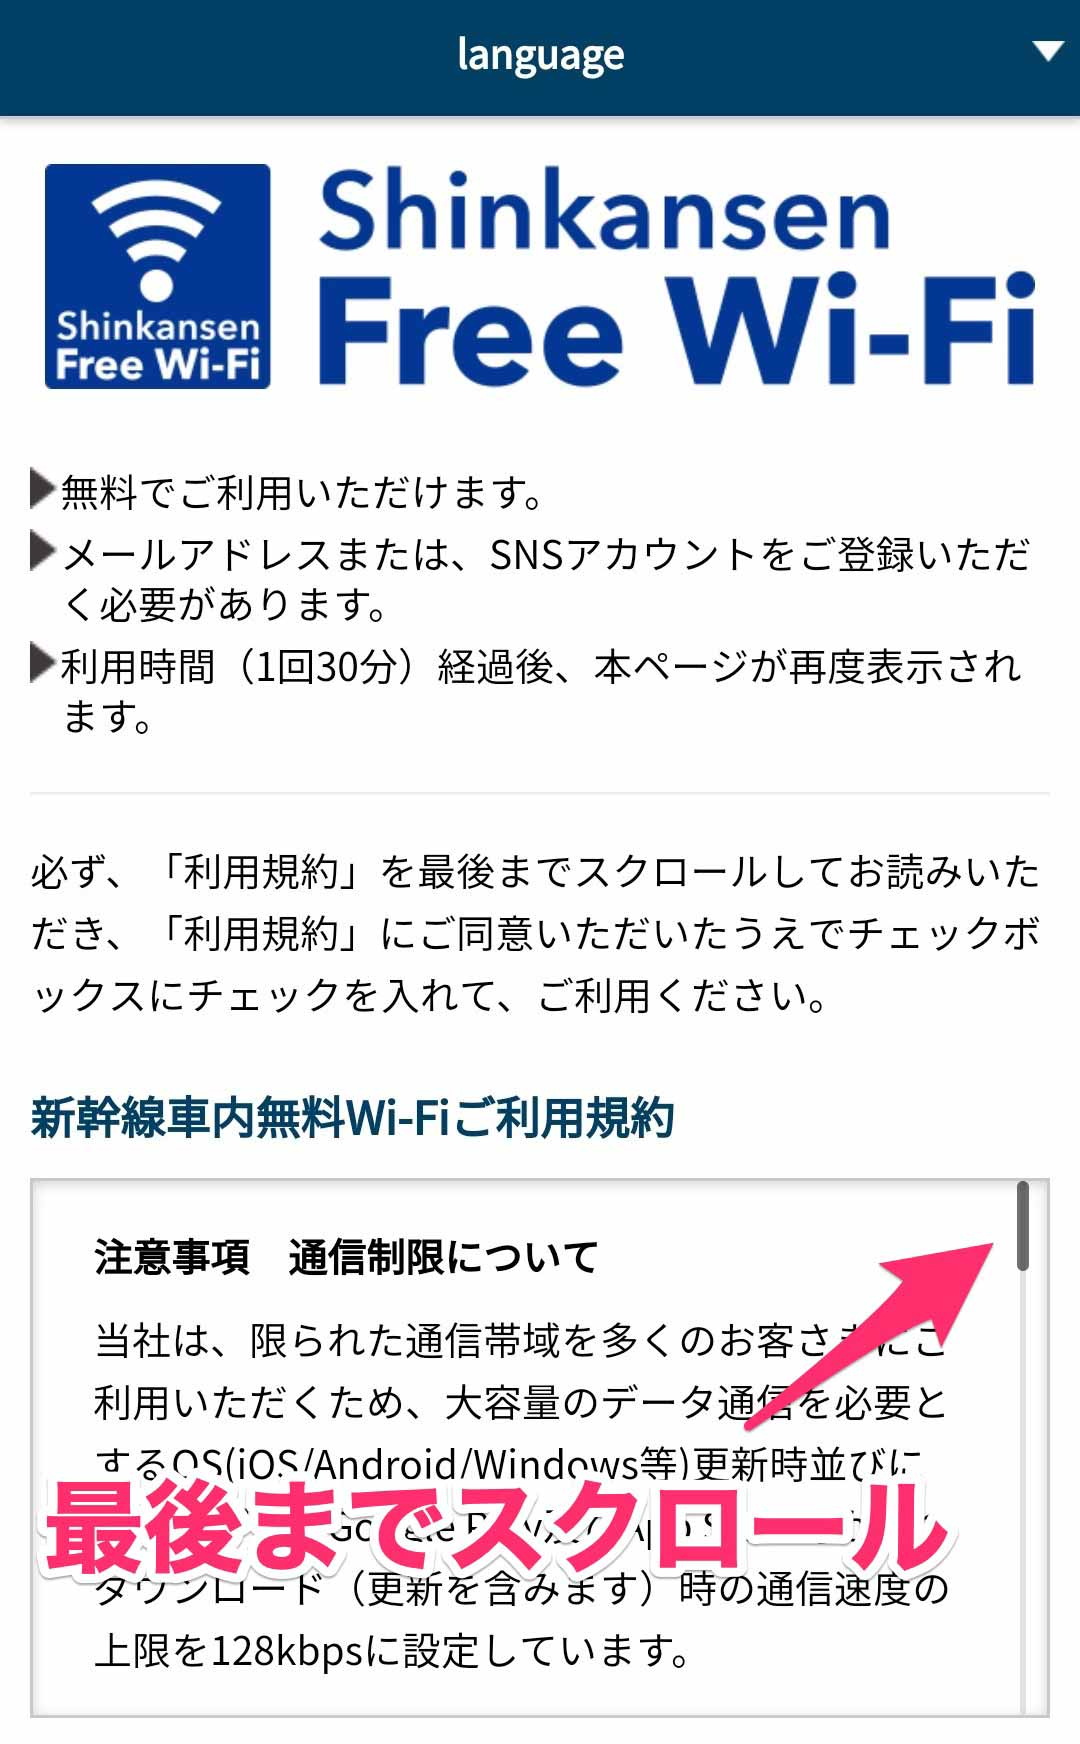 新幹線フリーWi-Fiの利用登録画面